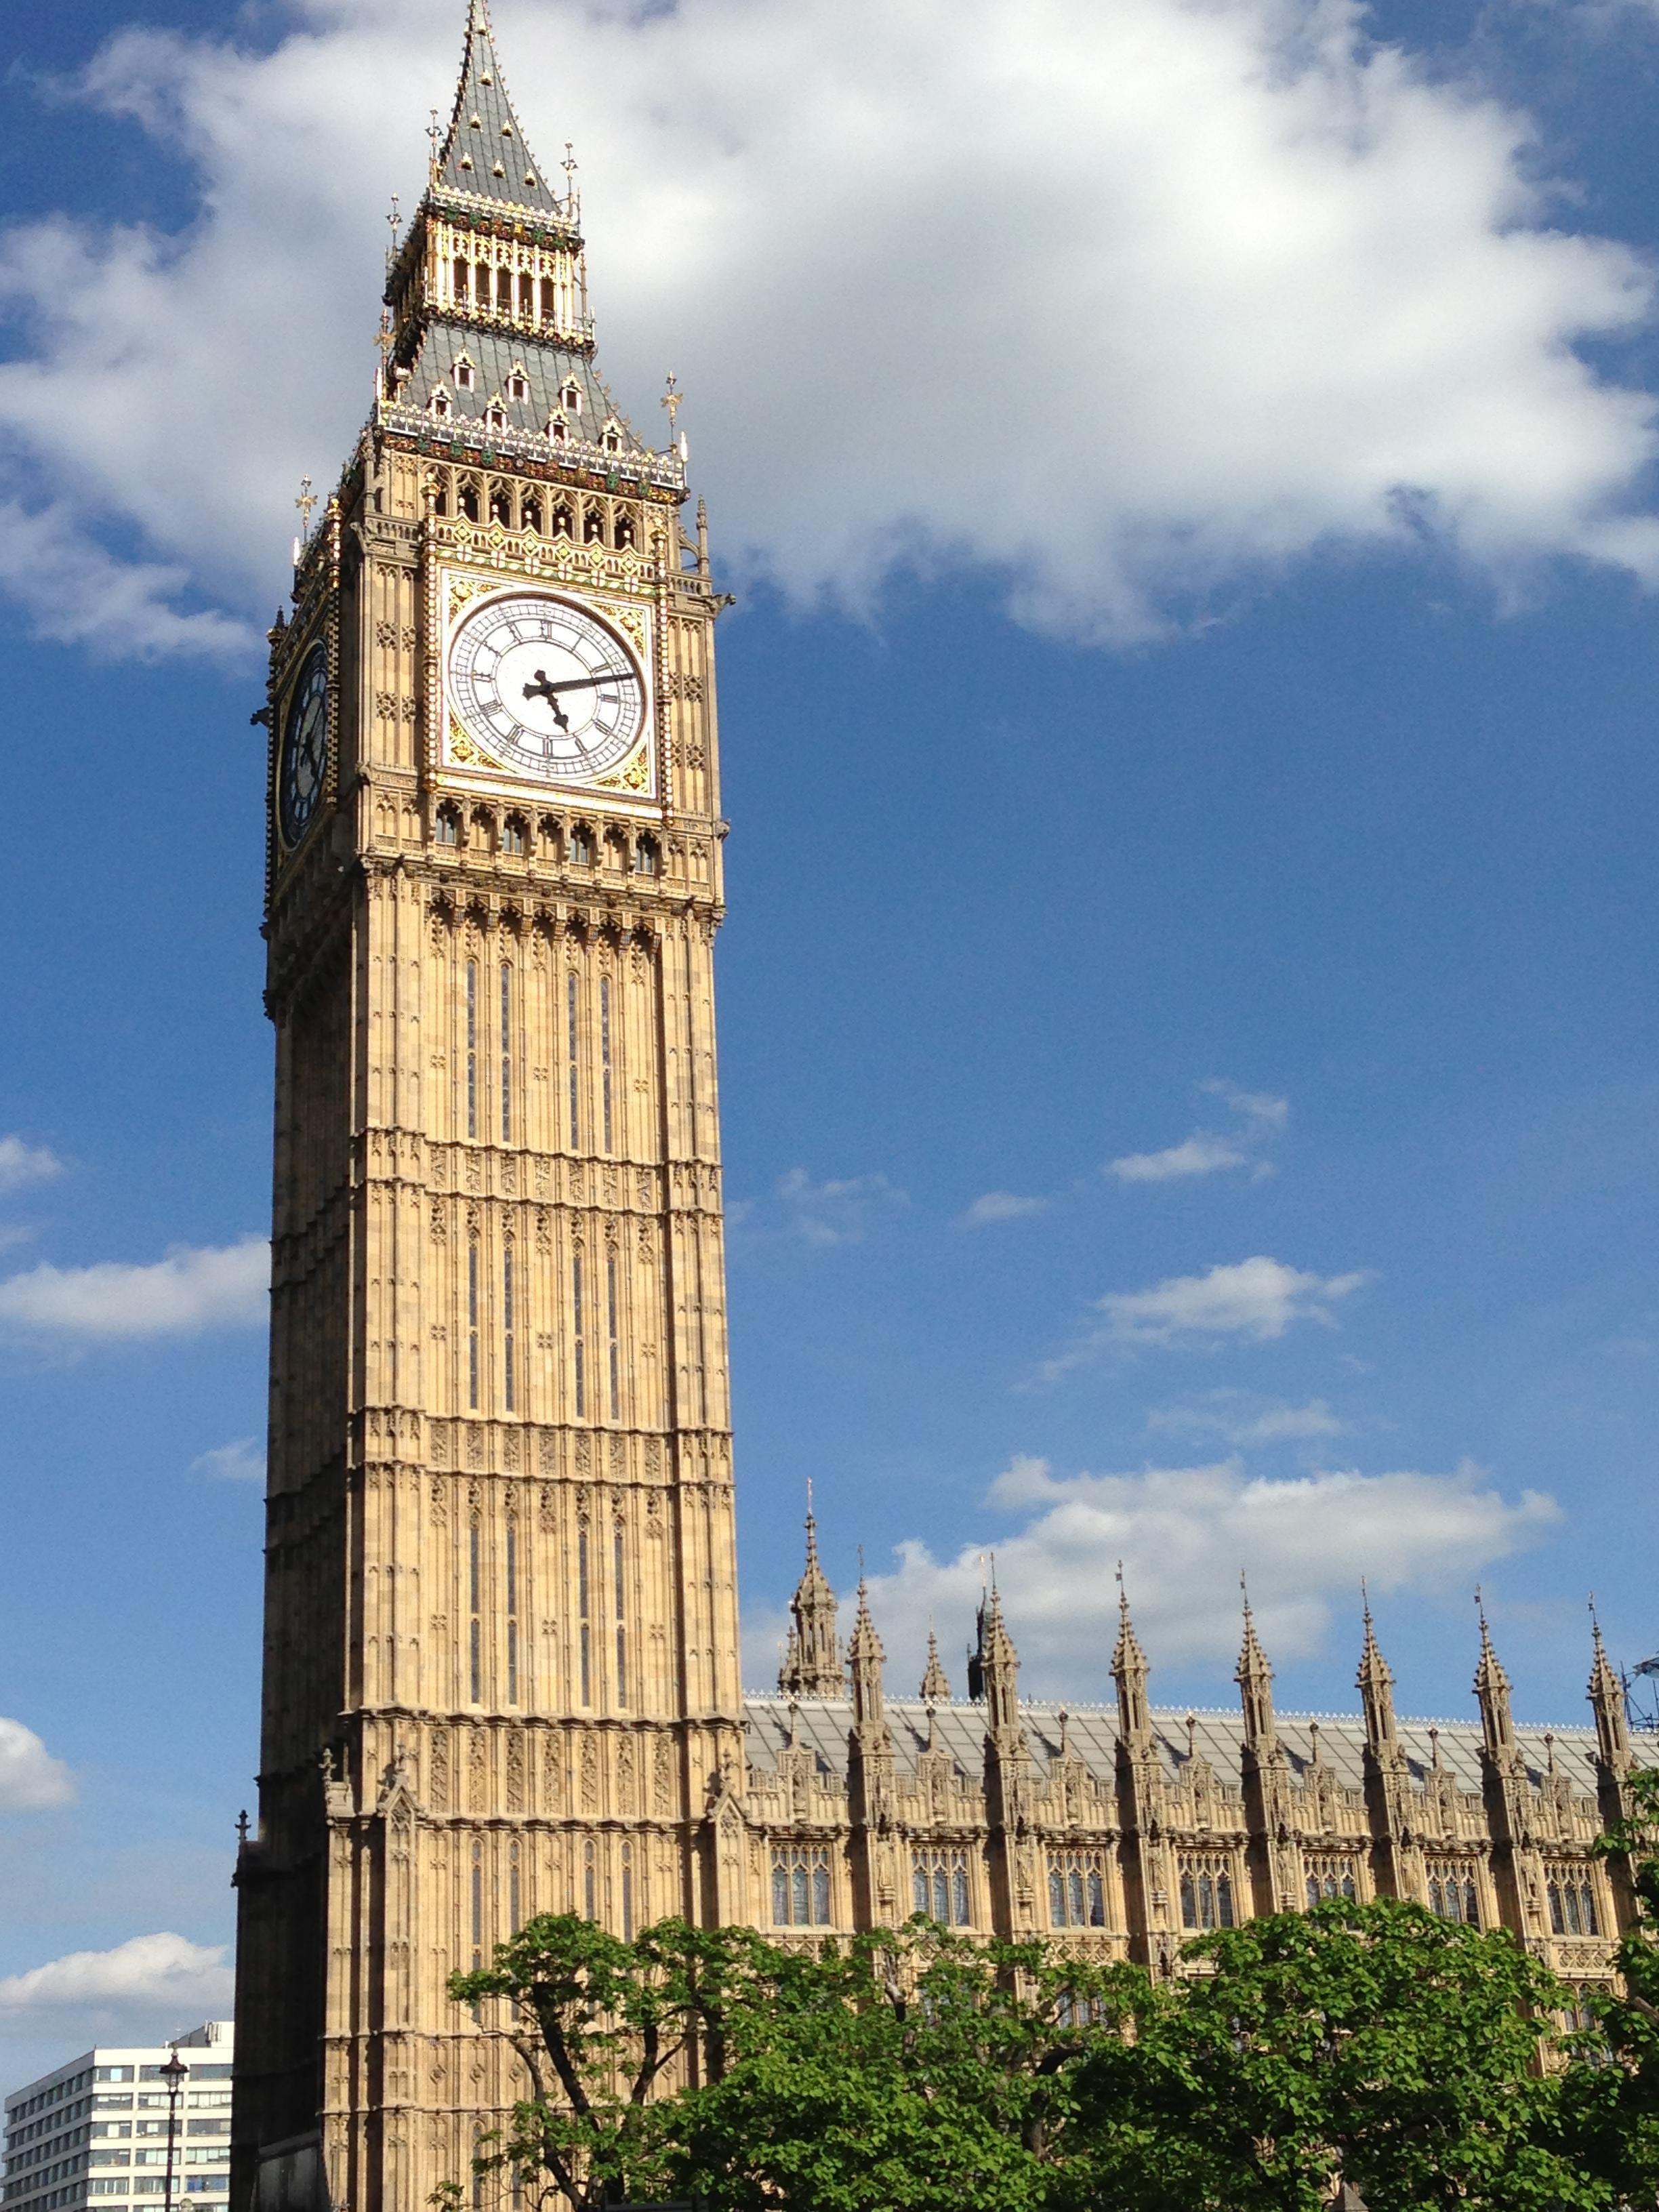 ... Palace of Westminster, London, UK - 20130629.jpg - Wikimedia Commons